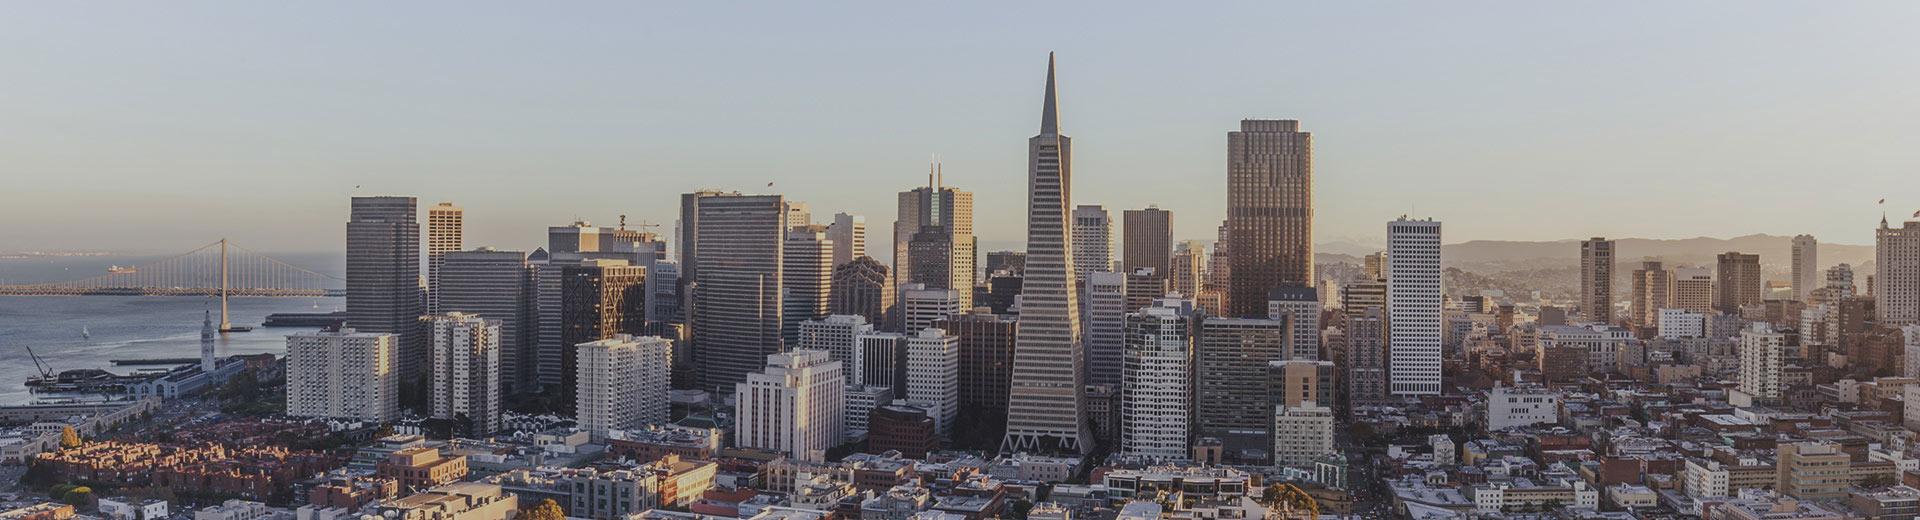 San-Francisco-App-Banner-01.17